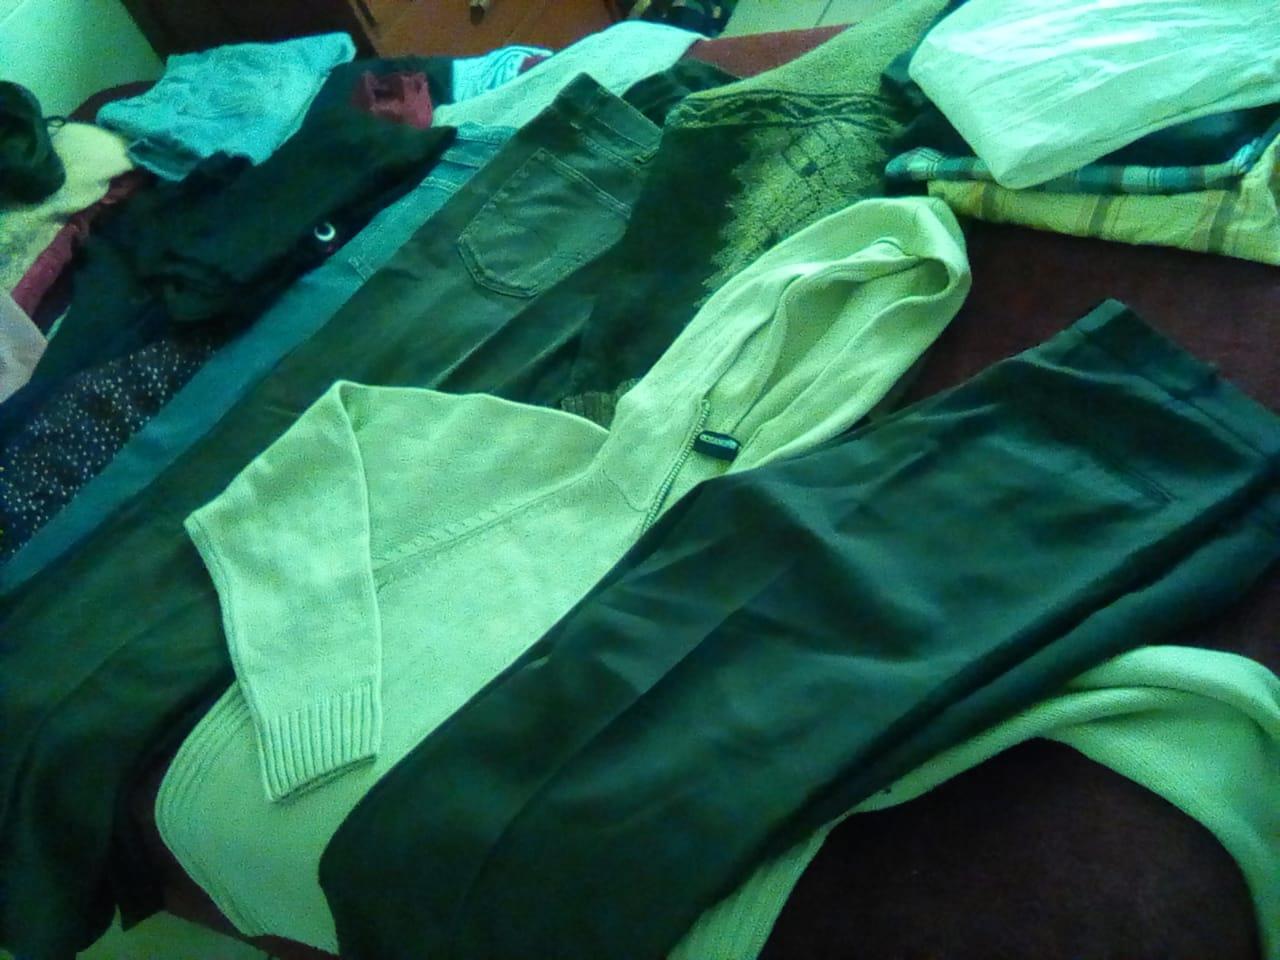 30 Clothing Items, Mixed